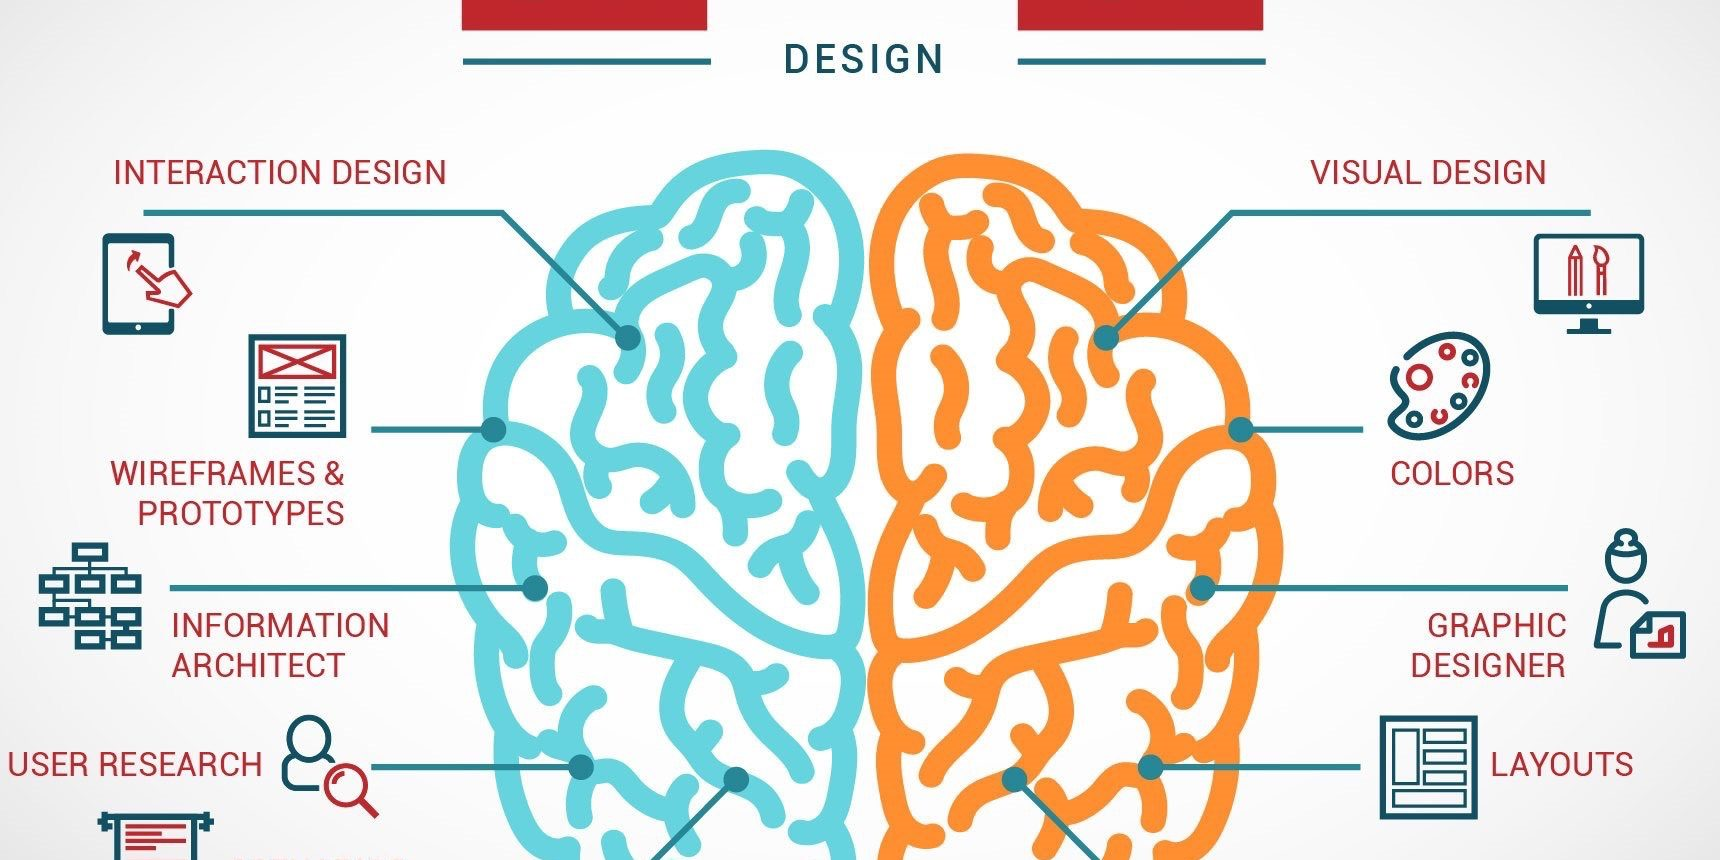 User Experience Design Ux Ui Training Certification Courses 2019 Prinstonsmart Com